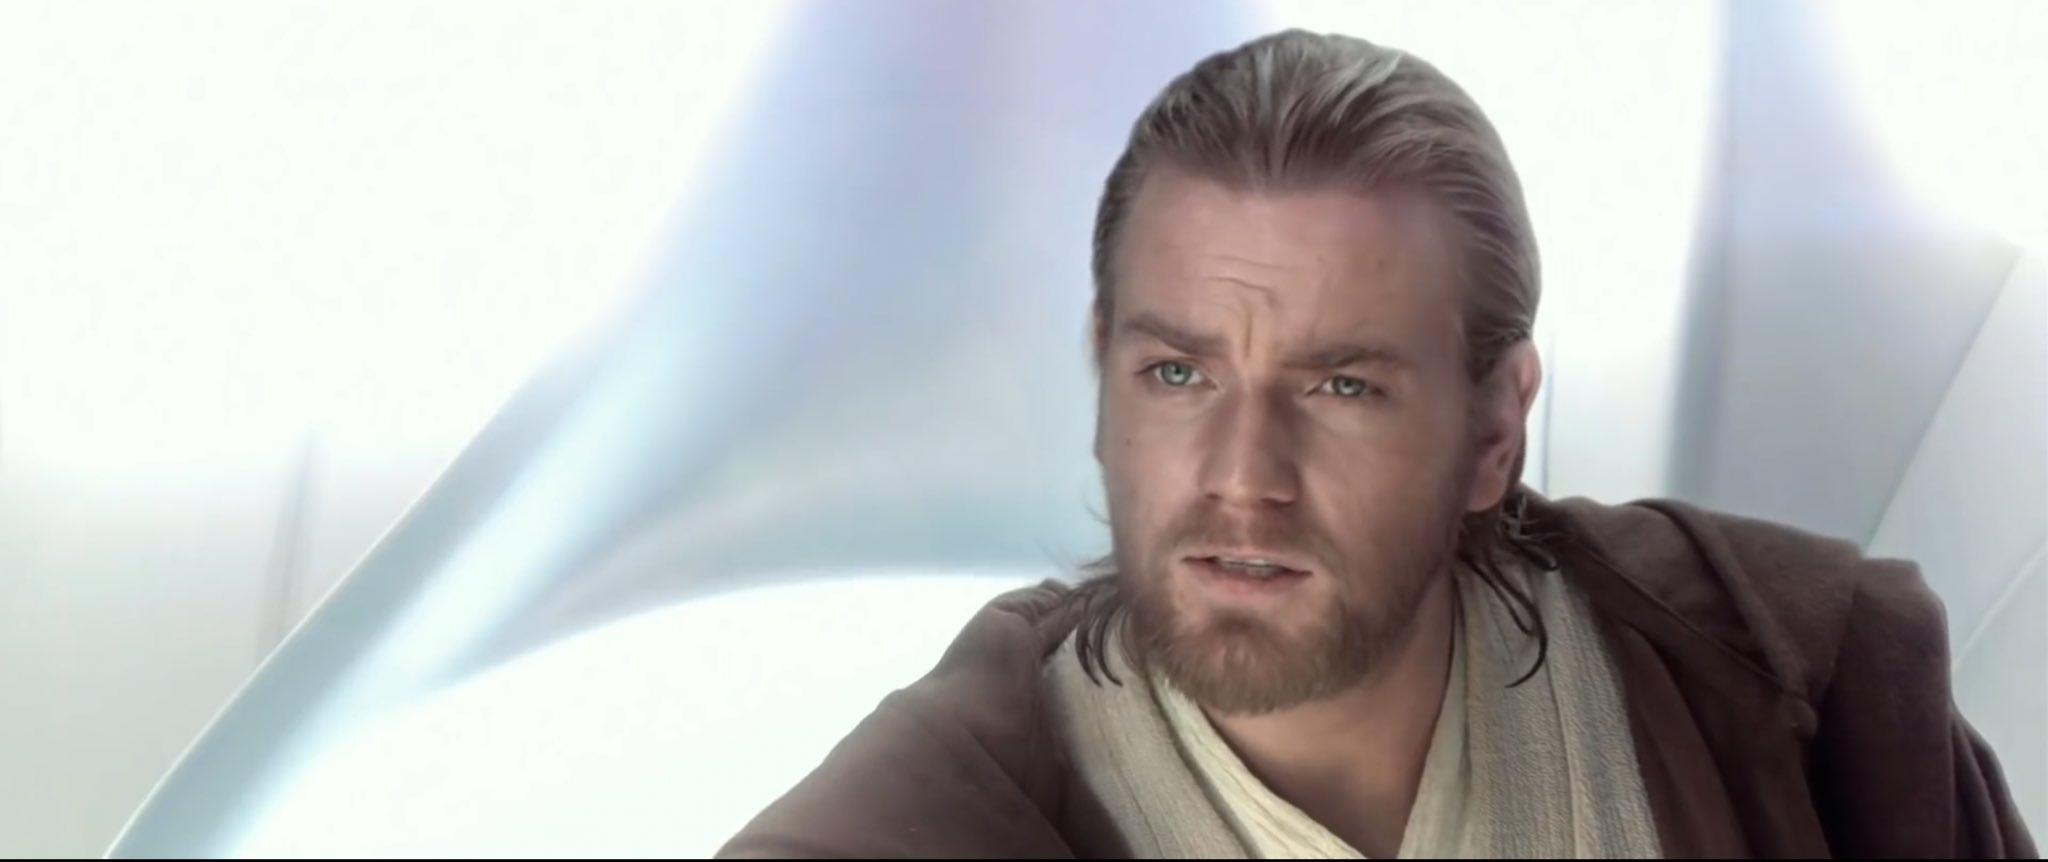 Wars sifo-dyas clone jedi meister Jedi Master